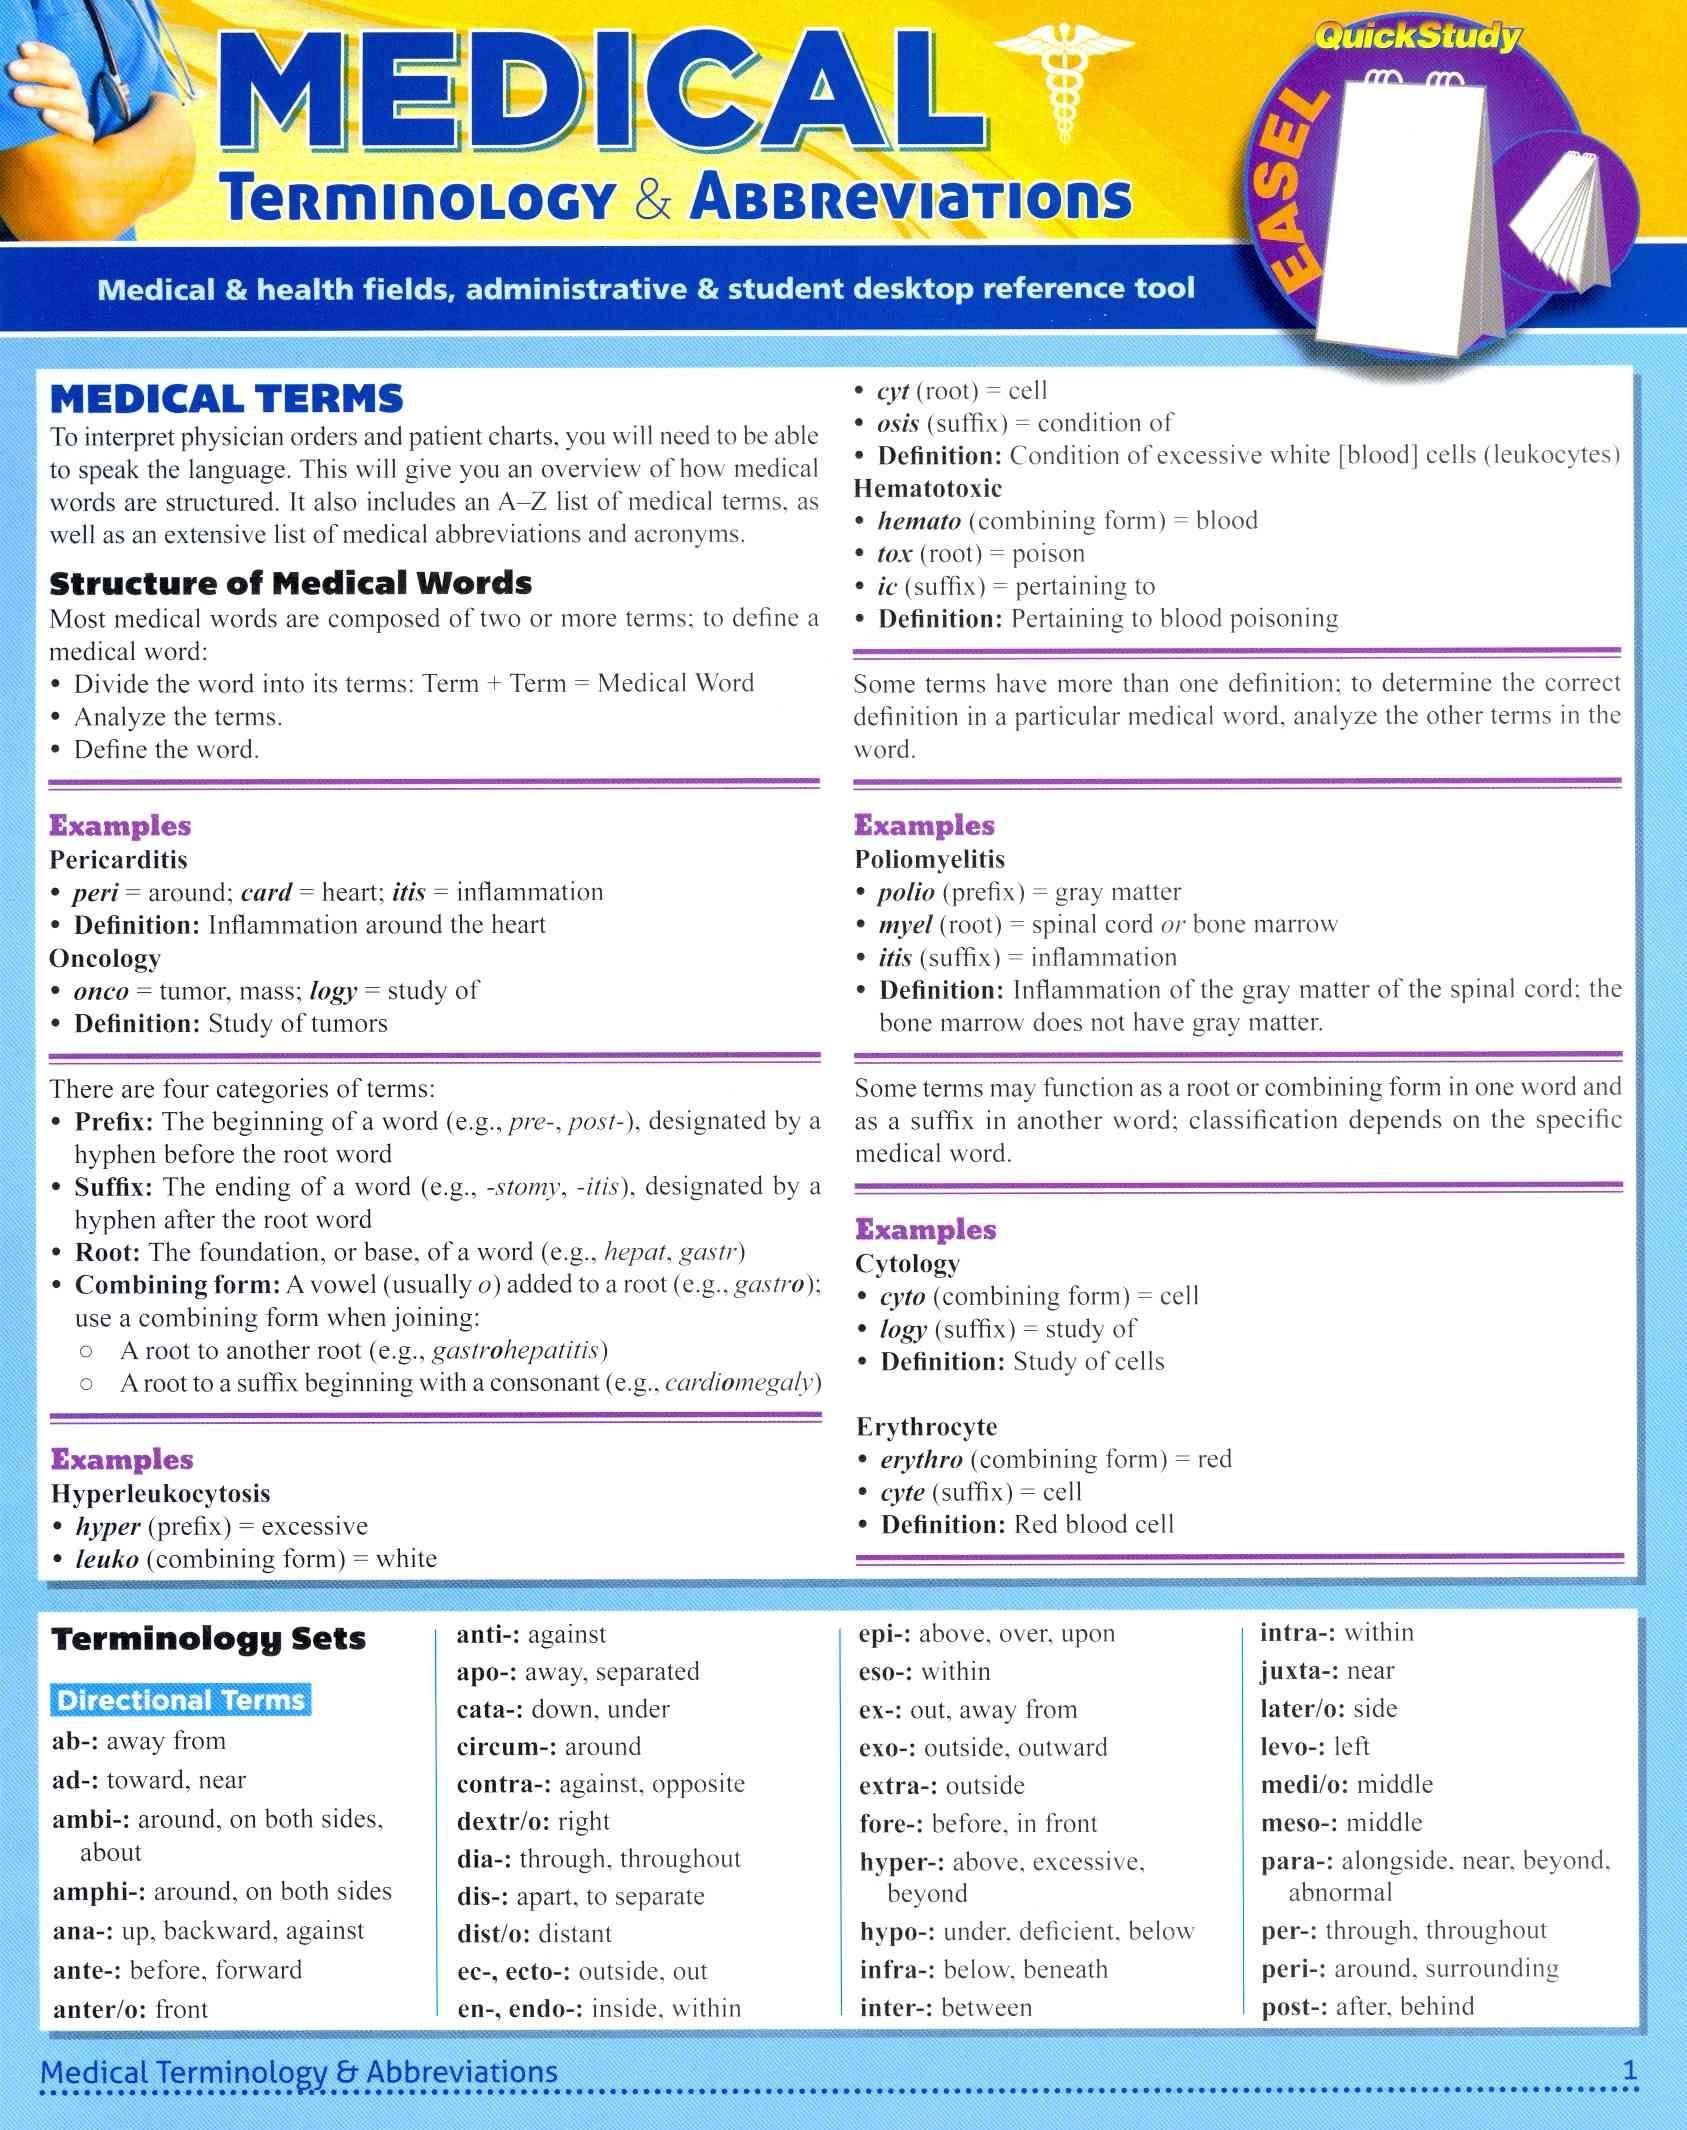 Medical Terminology Abbreviations Worksheet Medical Terminology & Abbreviations …